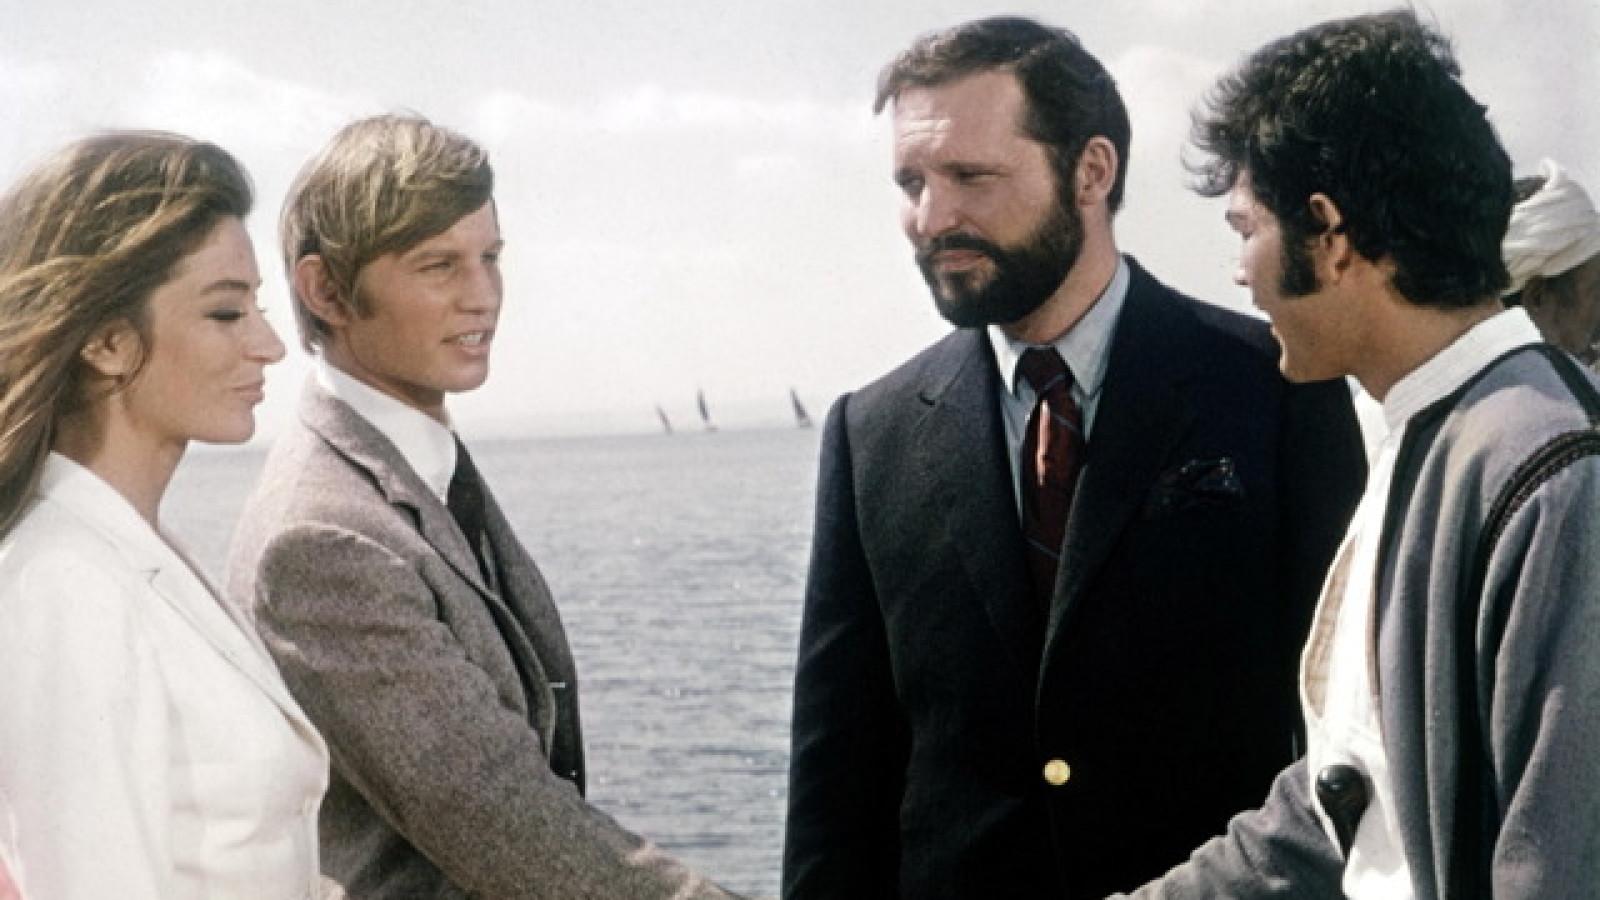 Anouk Aimée, Robert Forster, Michael York, and John Vernon in Justine (1969)